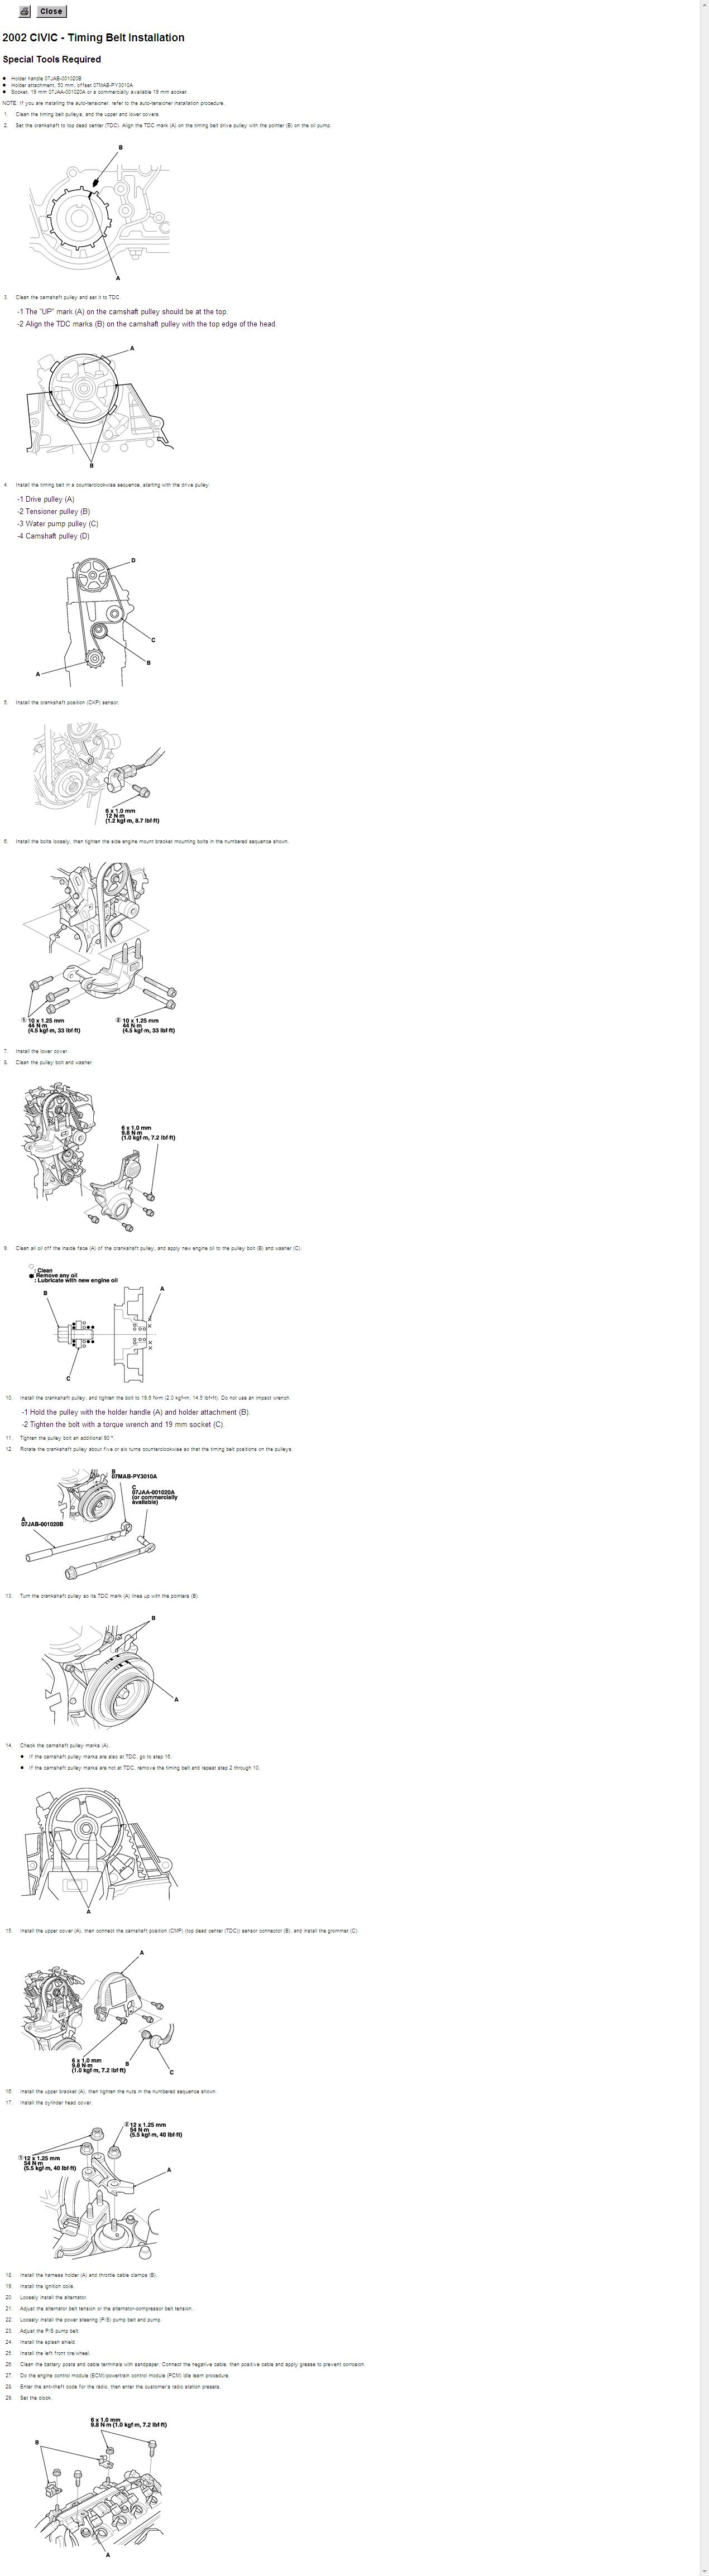 Anyone Have A Timing Belt Diagram For 02 Honda Civic Lx 1 7 Lt